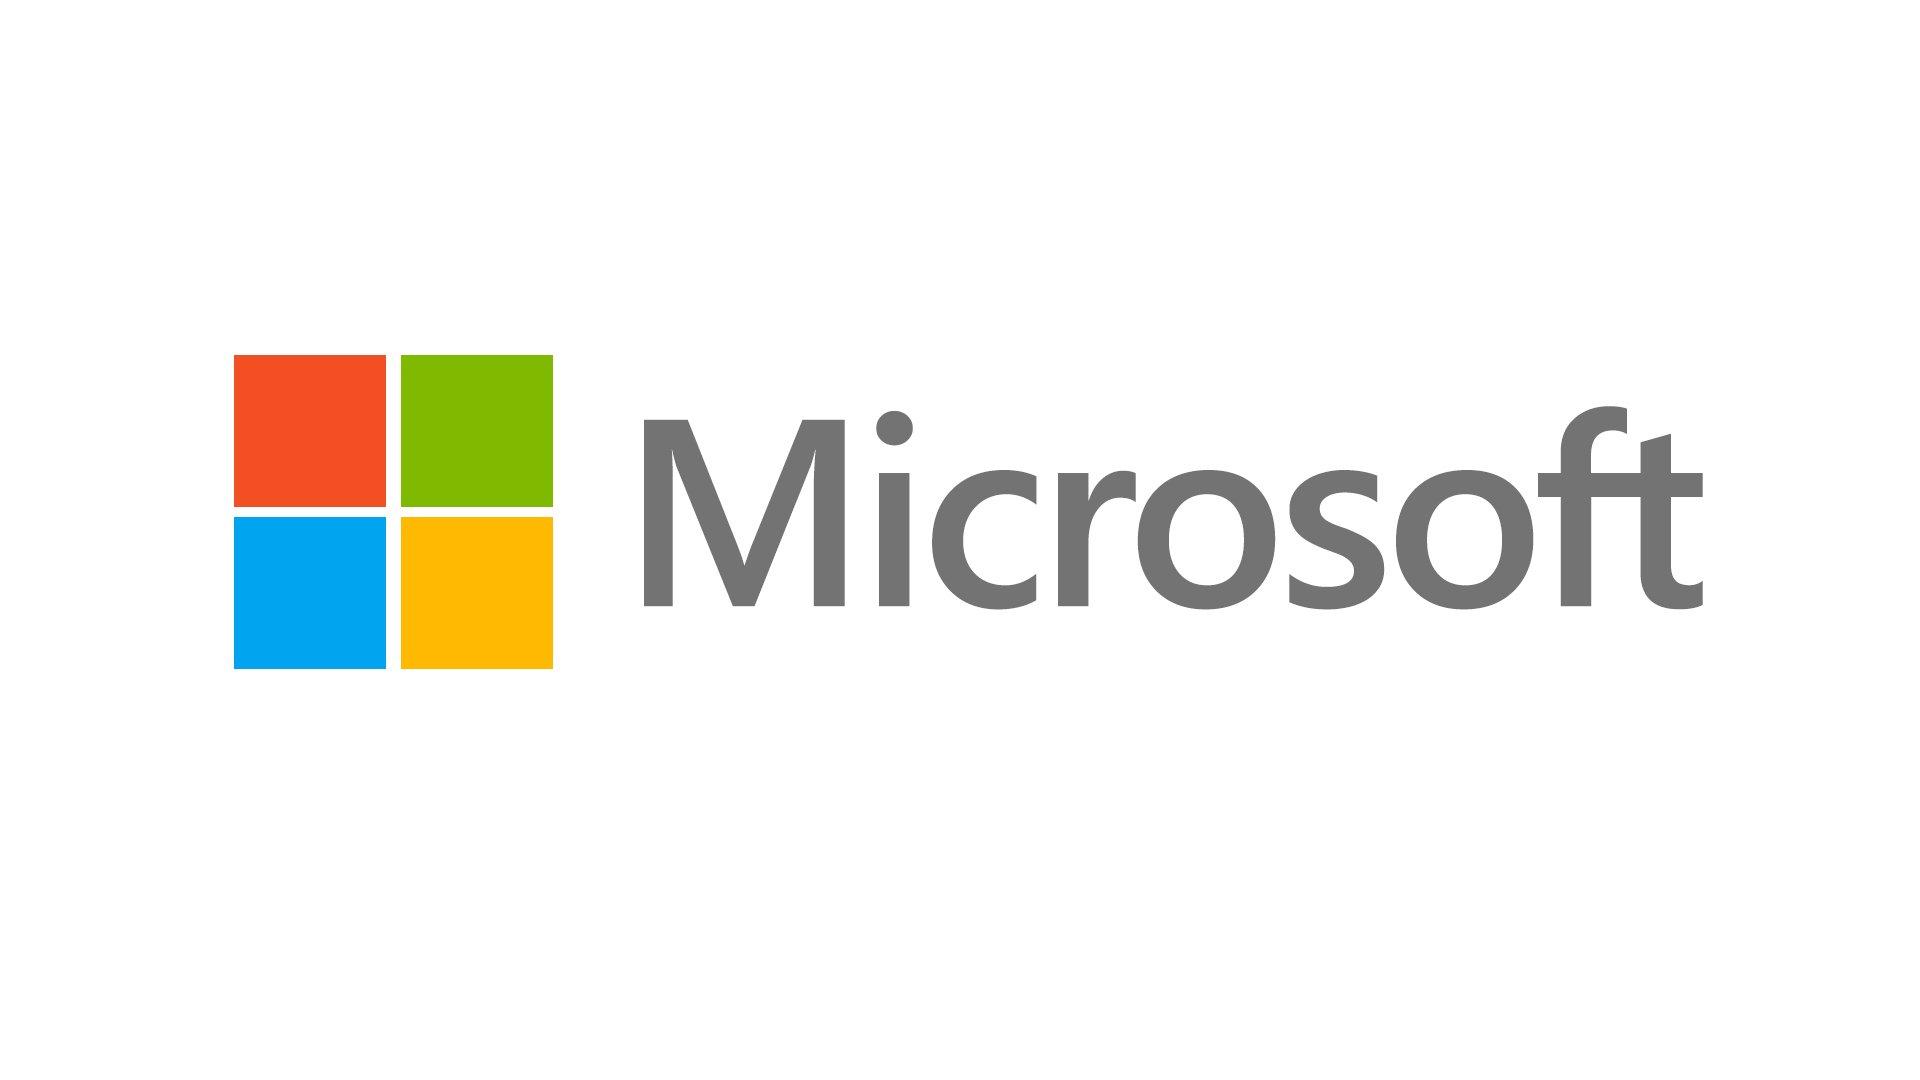 Слух: Rio – сервис Microsoft для онлайн-стриминга игр  Во время ежегодной встречи внутренних команд Microsoft прошла ... - Изображение 1